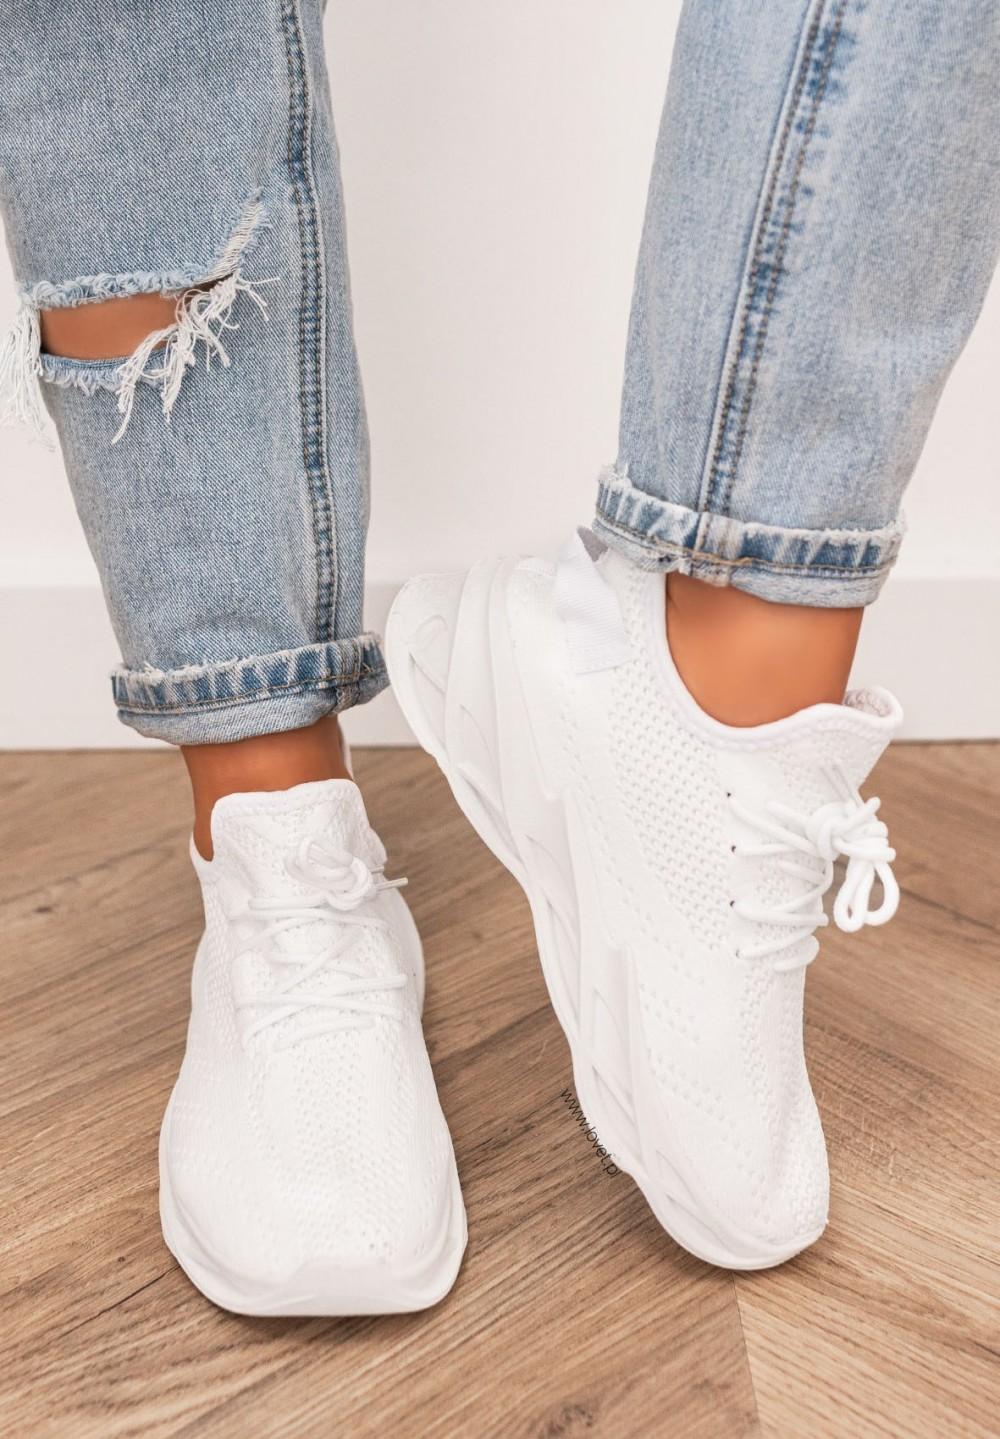 Trampki Sneakersy Siateczkowe Białe Felise